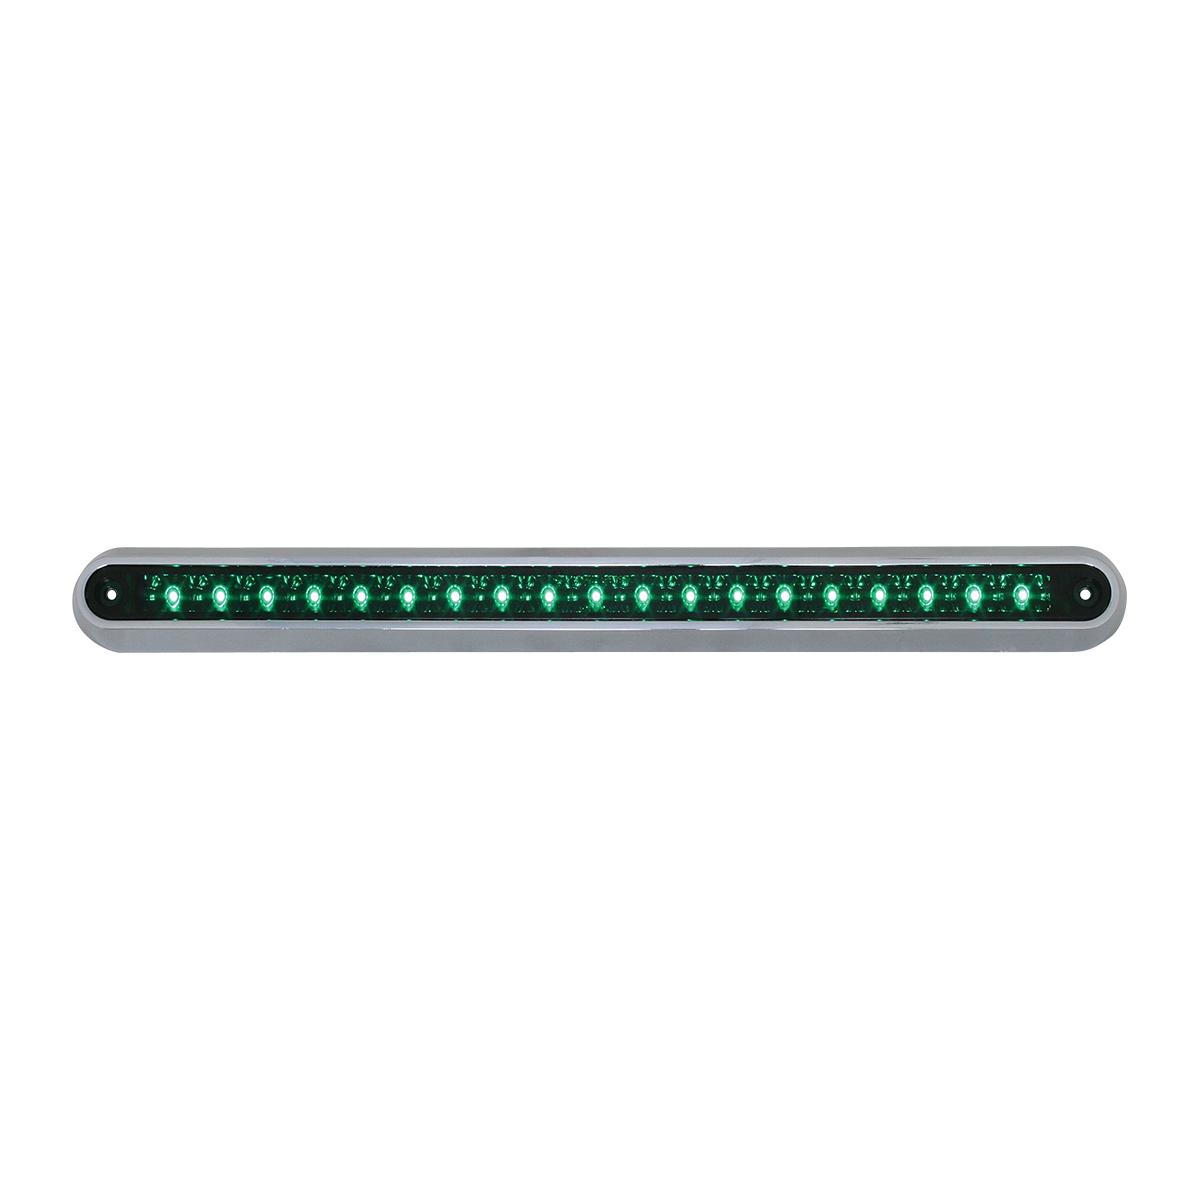 "76293 12"" Surface Mount Light Bar with Chrome Plastic Base"